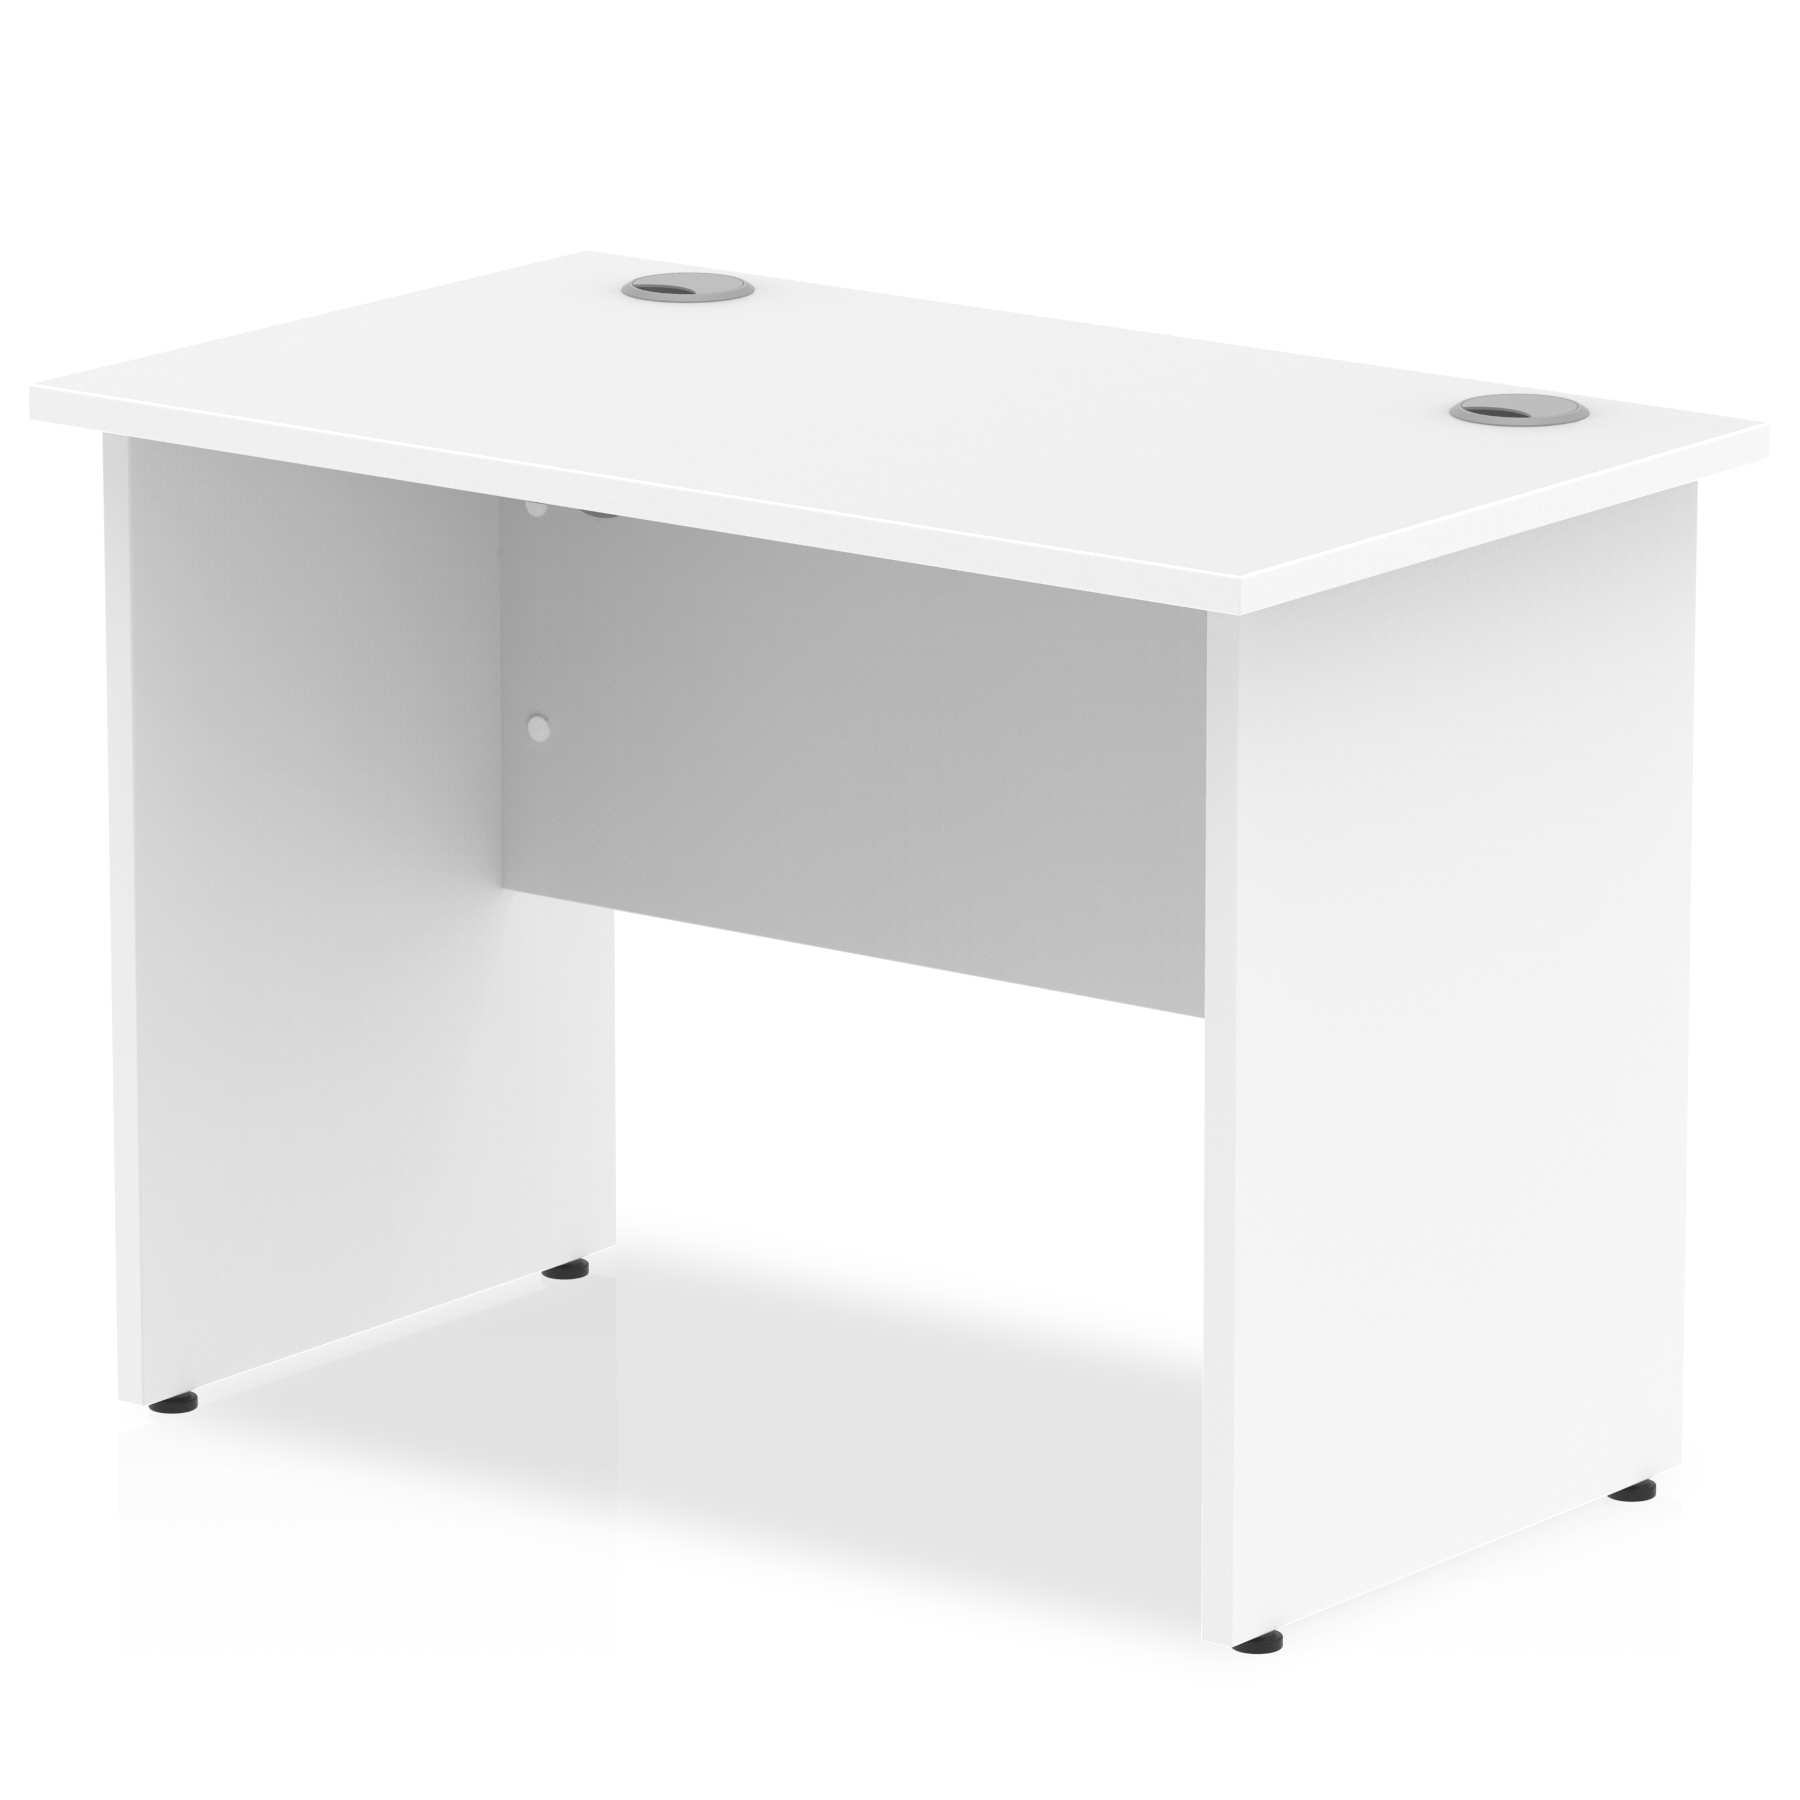 Trexus Desk Rectangle Panel End Leg 1000x600mm White Ref MI002245